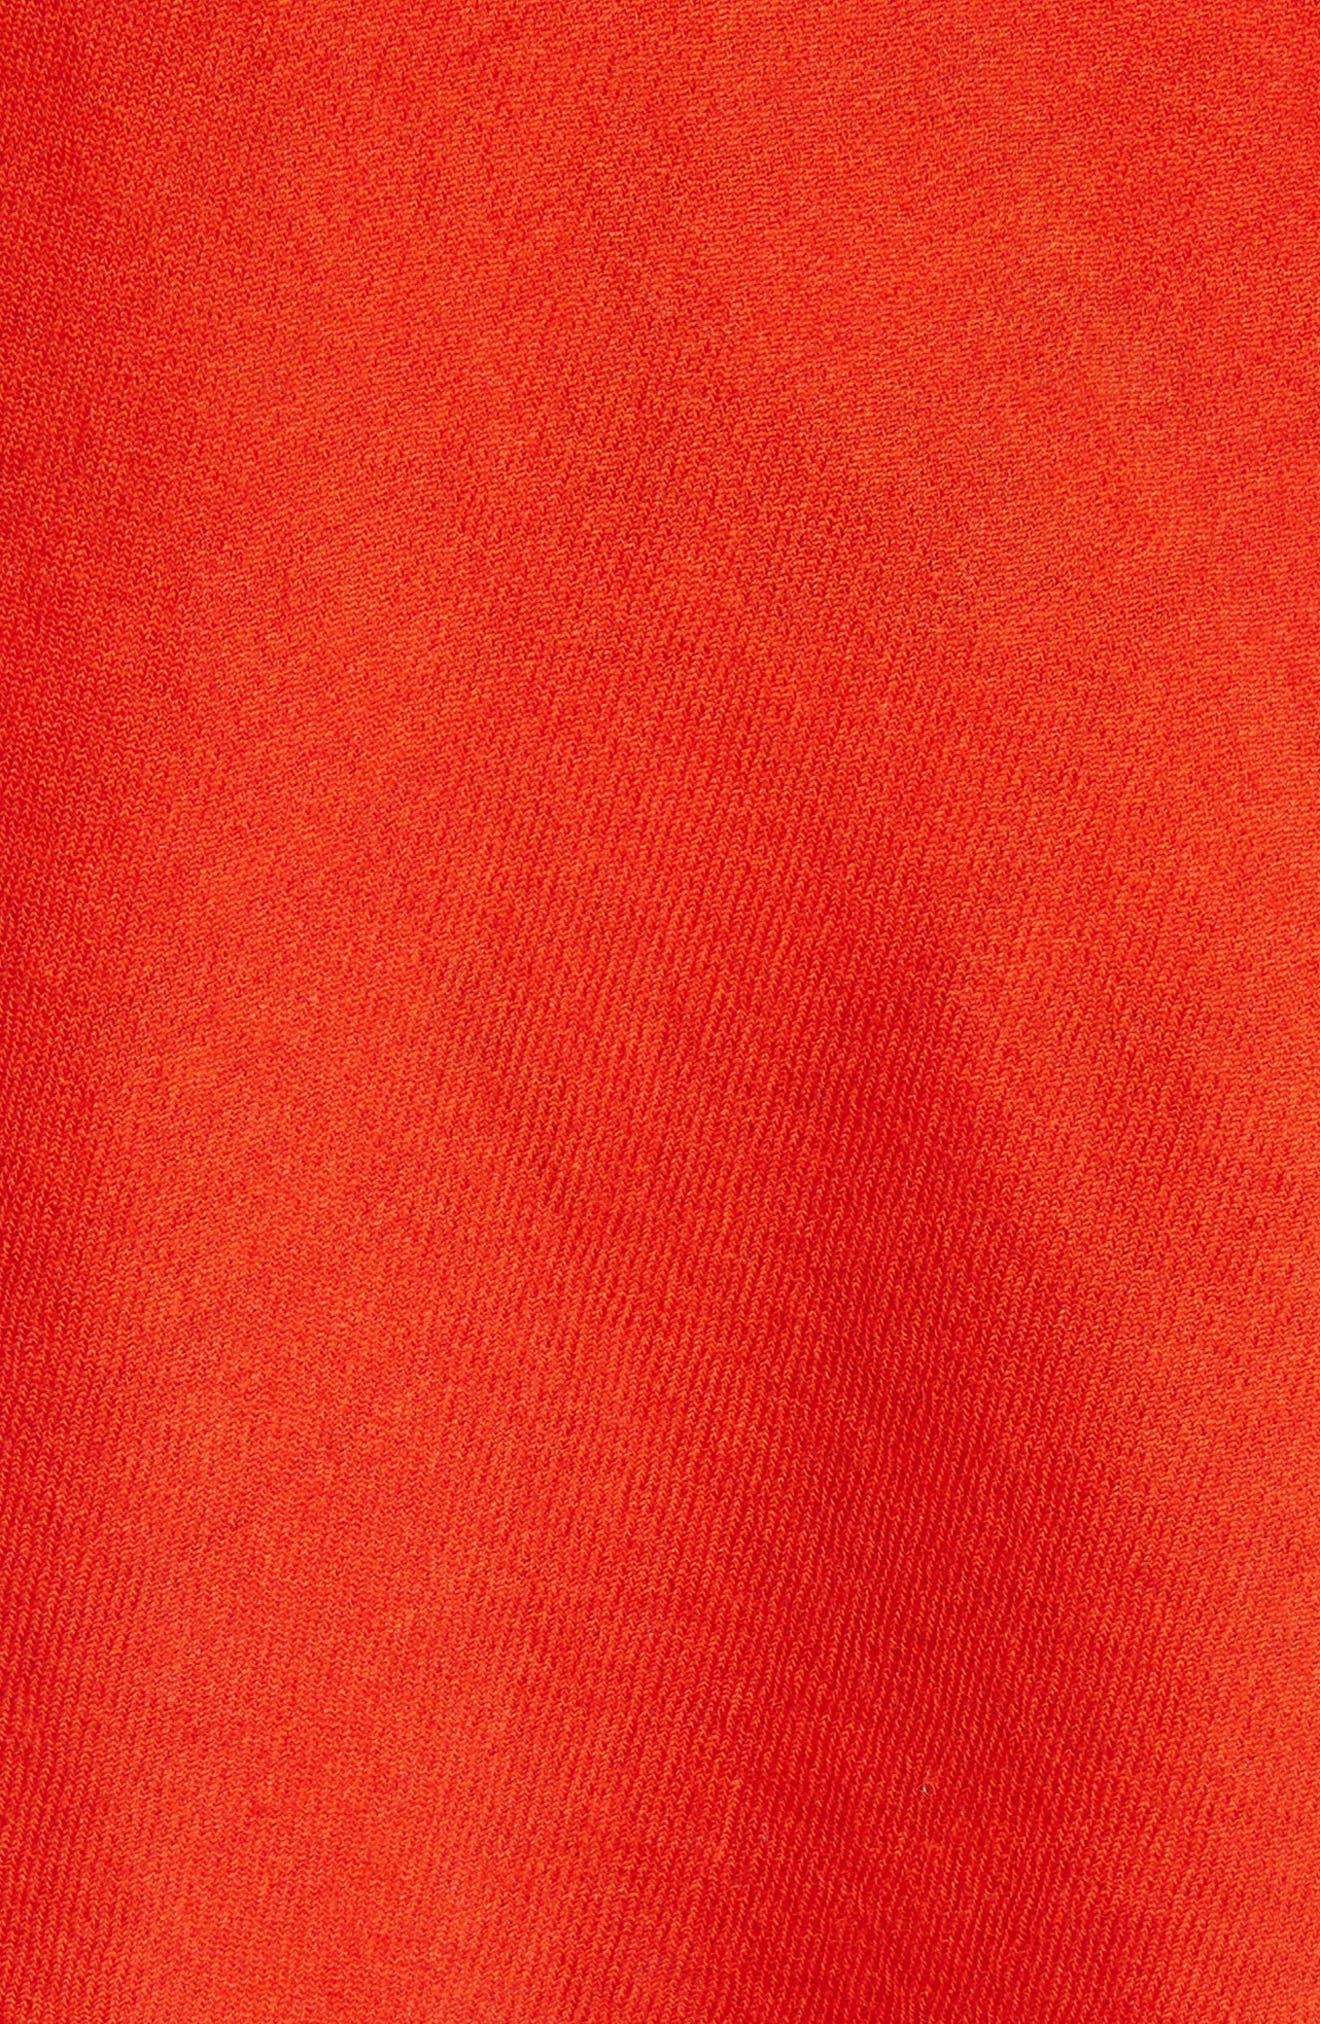 Alternate Image 5  - Richard Malone Draped Split One-Shoulder Top